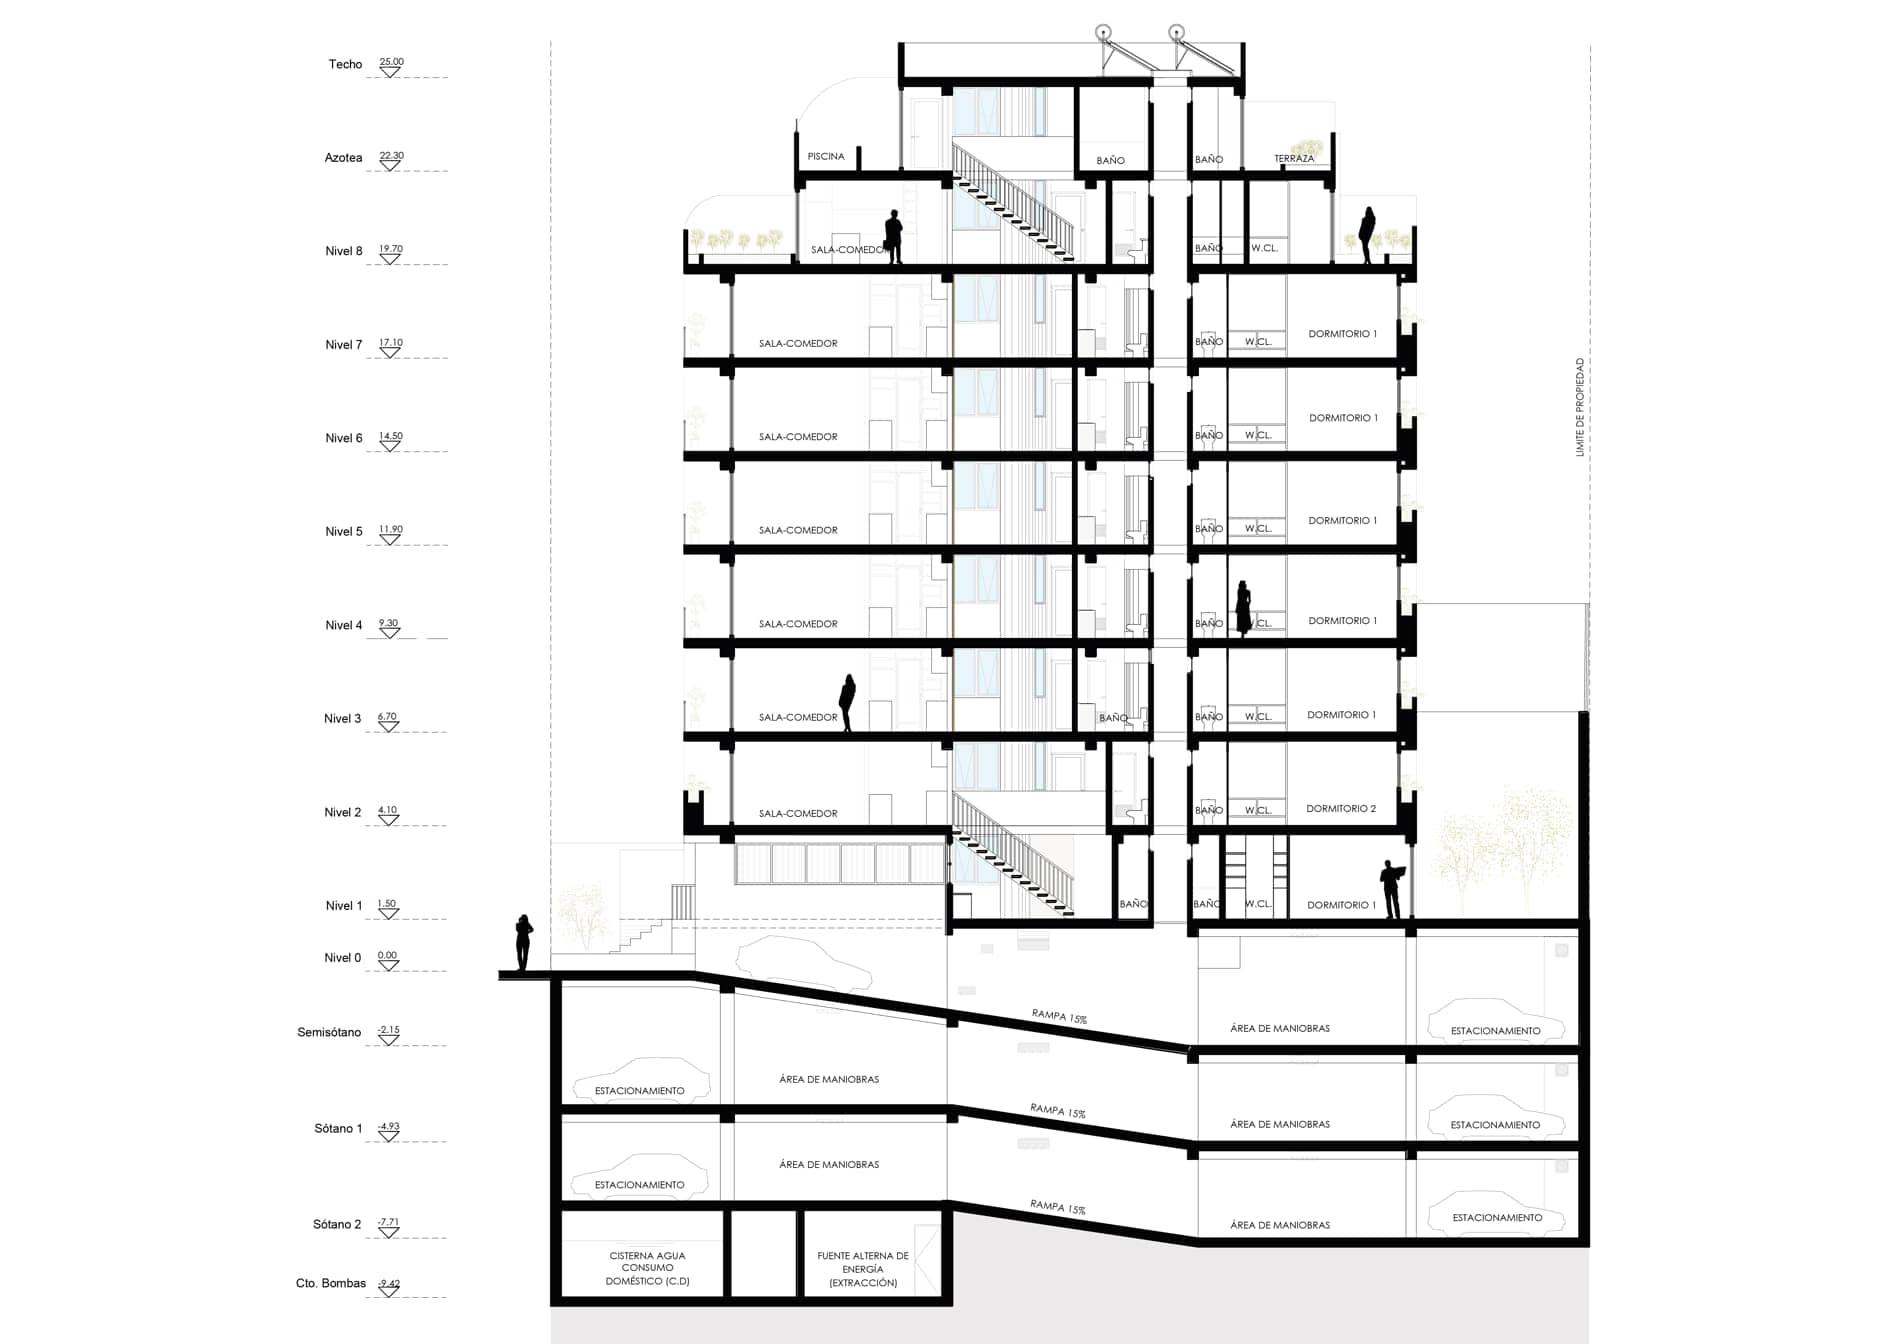 alt=Corte 2 de vivienda multifamiliar calle francia